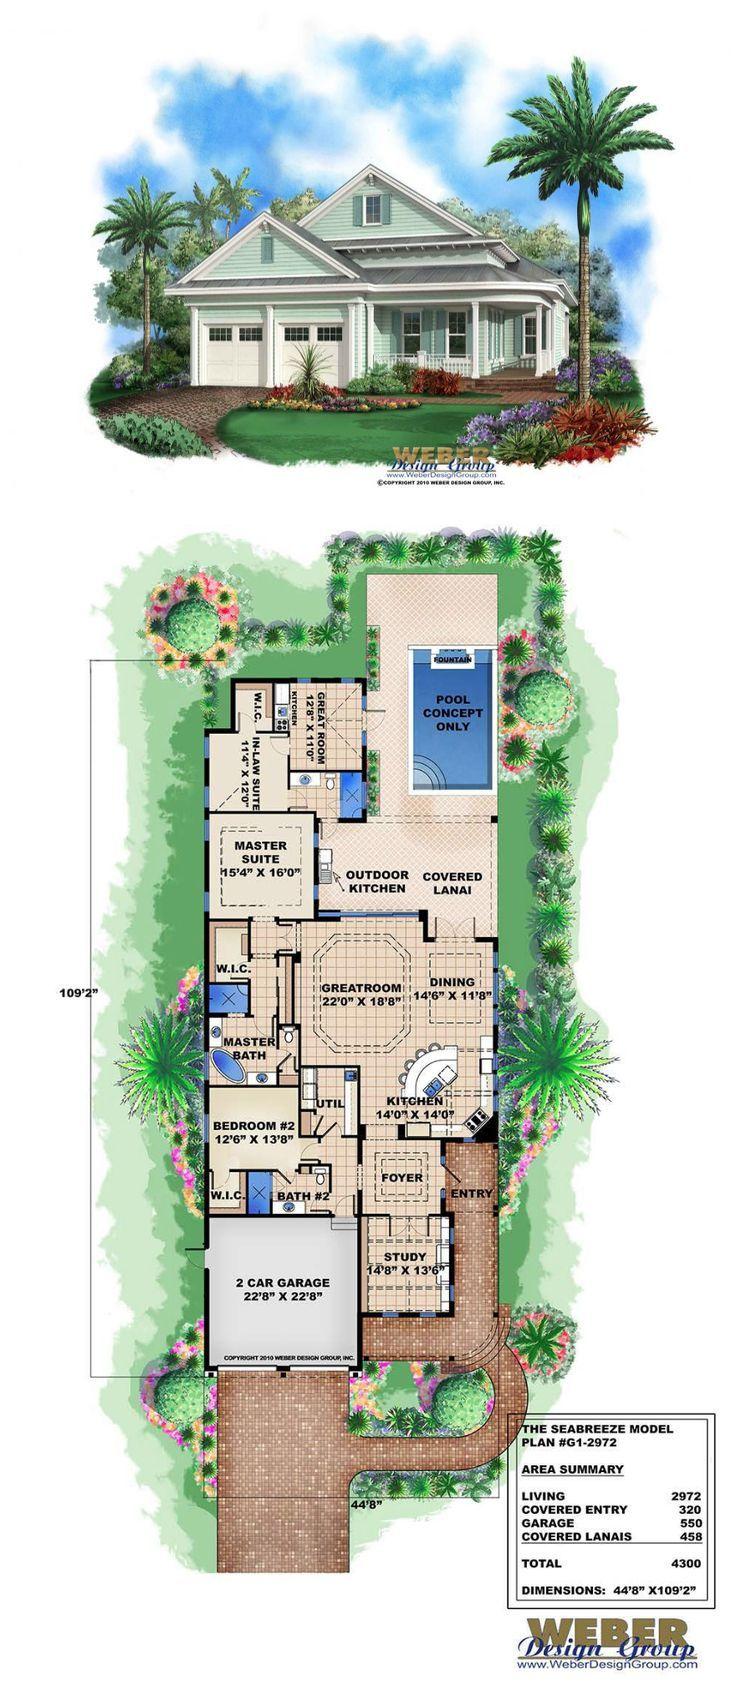 Seabreeze House Plan Narrow house plans